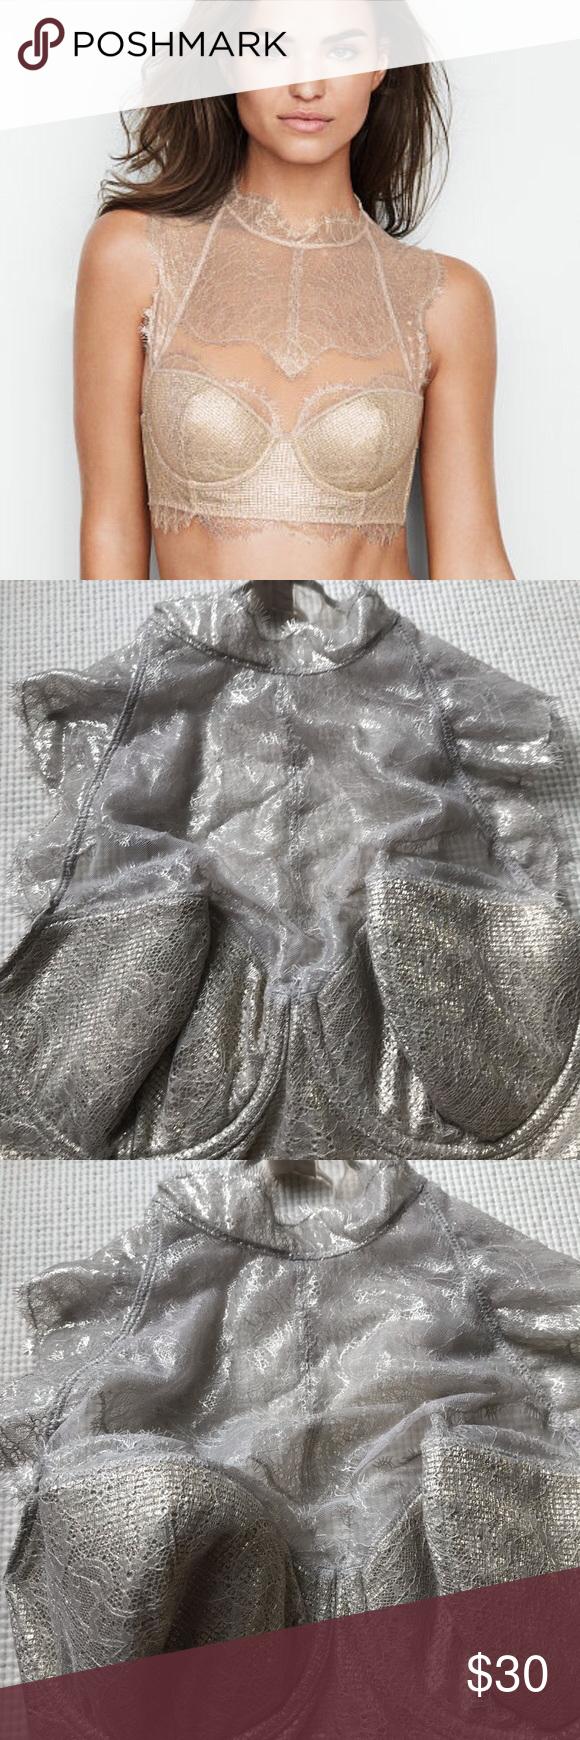 NWT VICTORIA/'S SECRET Dream Angels Lined Demi Bra High-neck Gold 32D